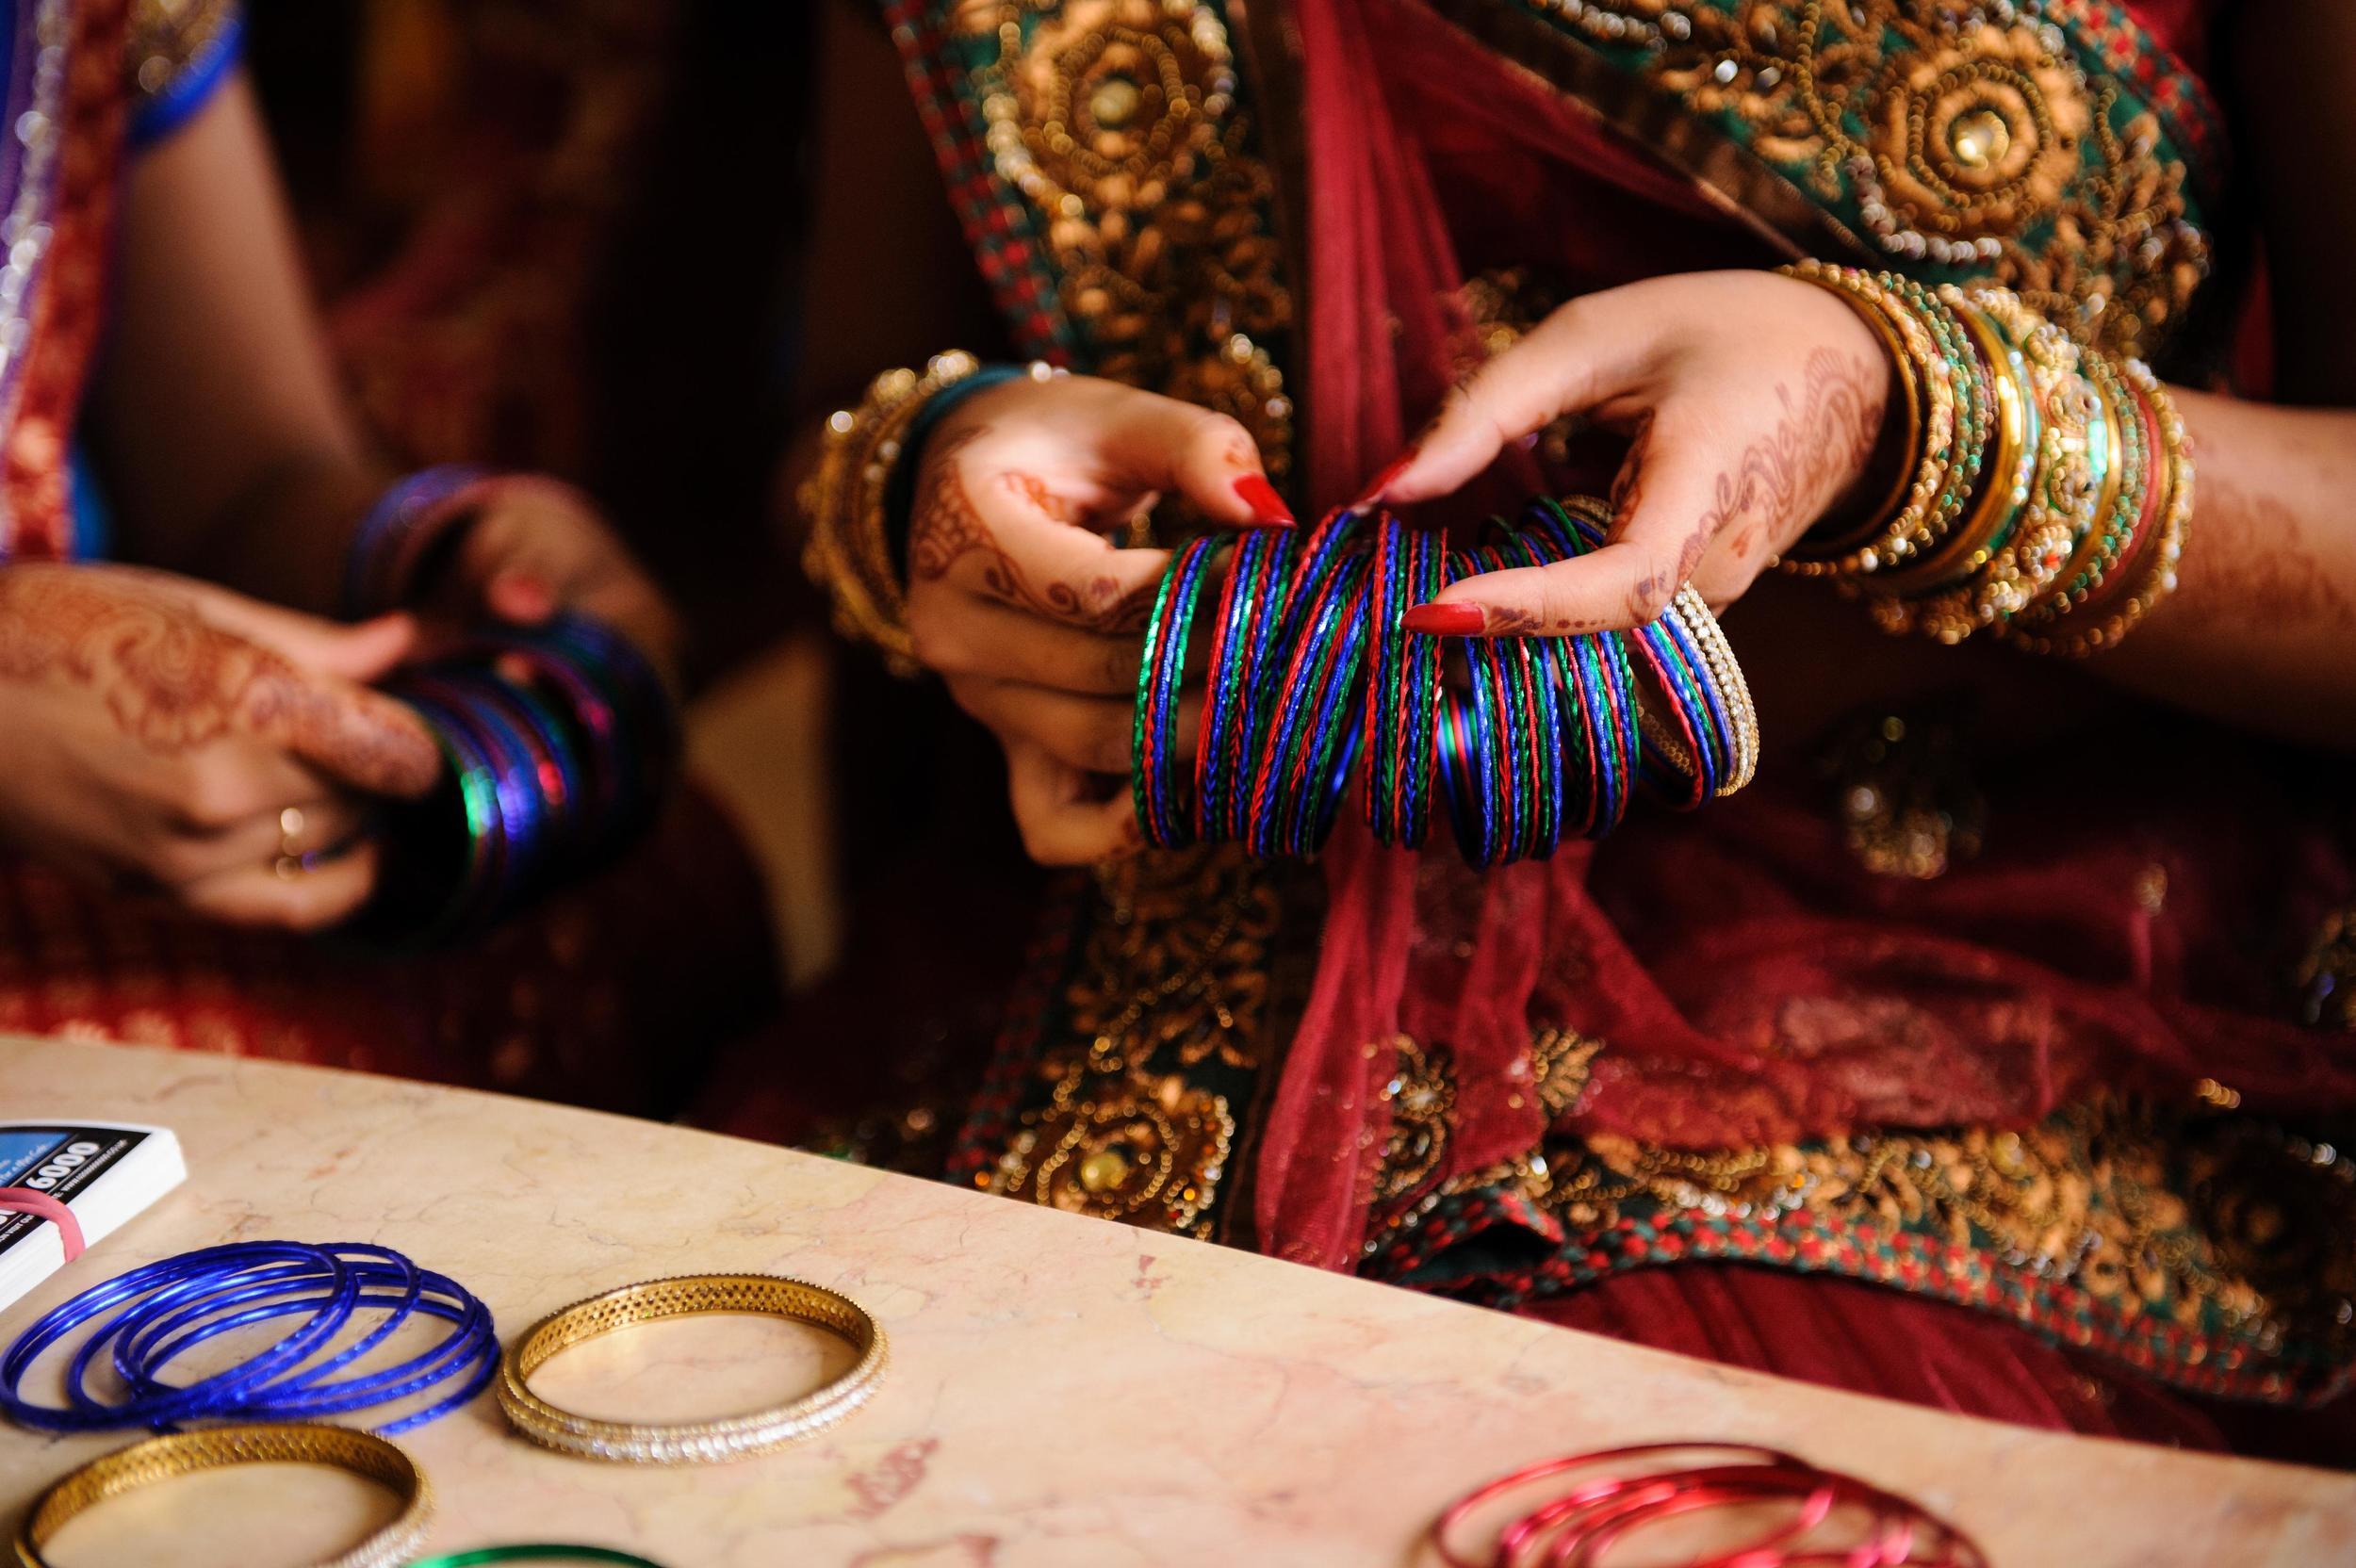 payal_and_bhavik_wedding-25.jpeg